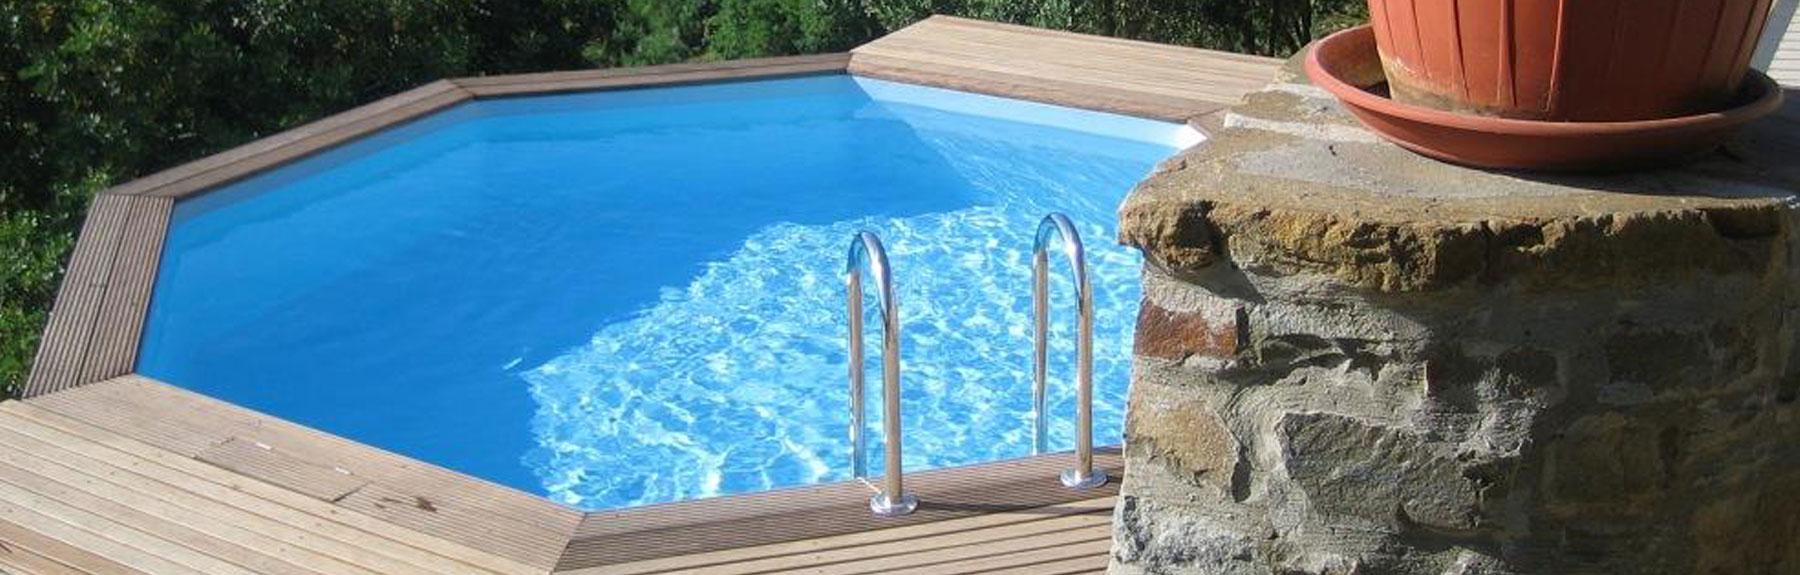 Vente et installation de piscines spas saunas et hammam for Accessoire piscine epinal